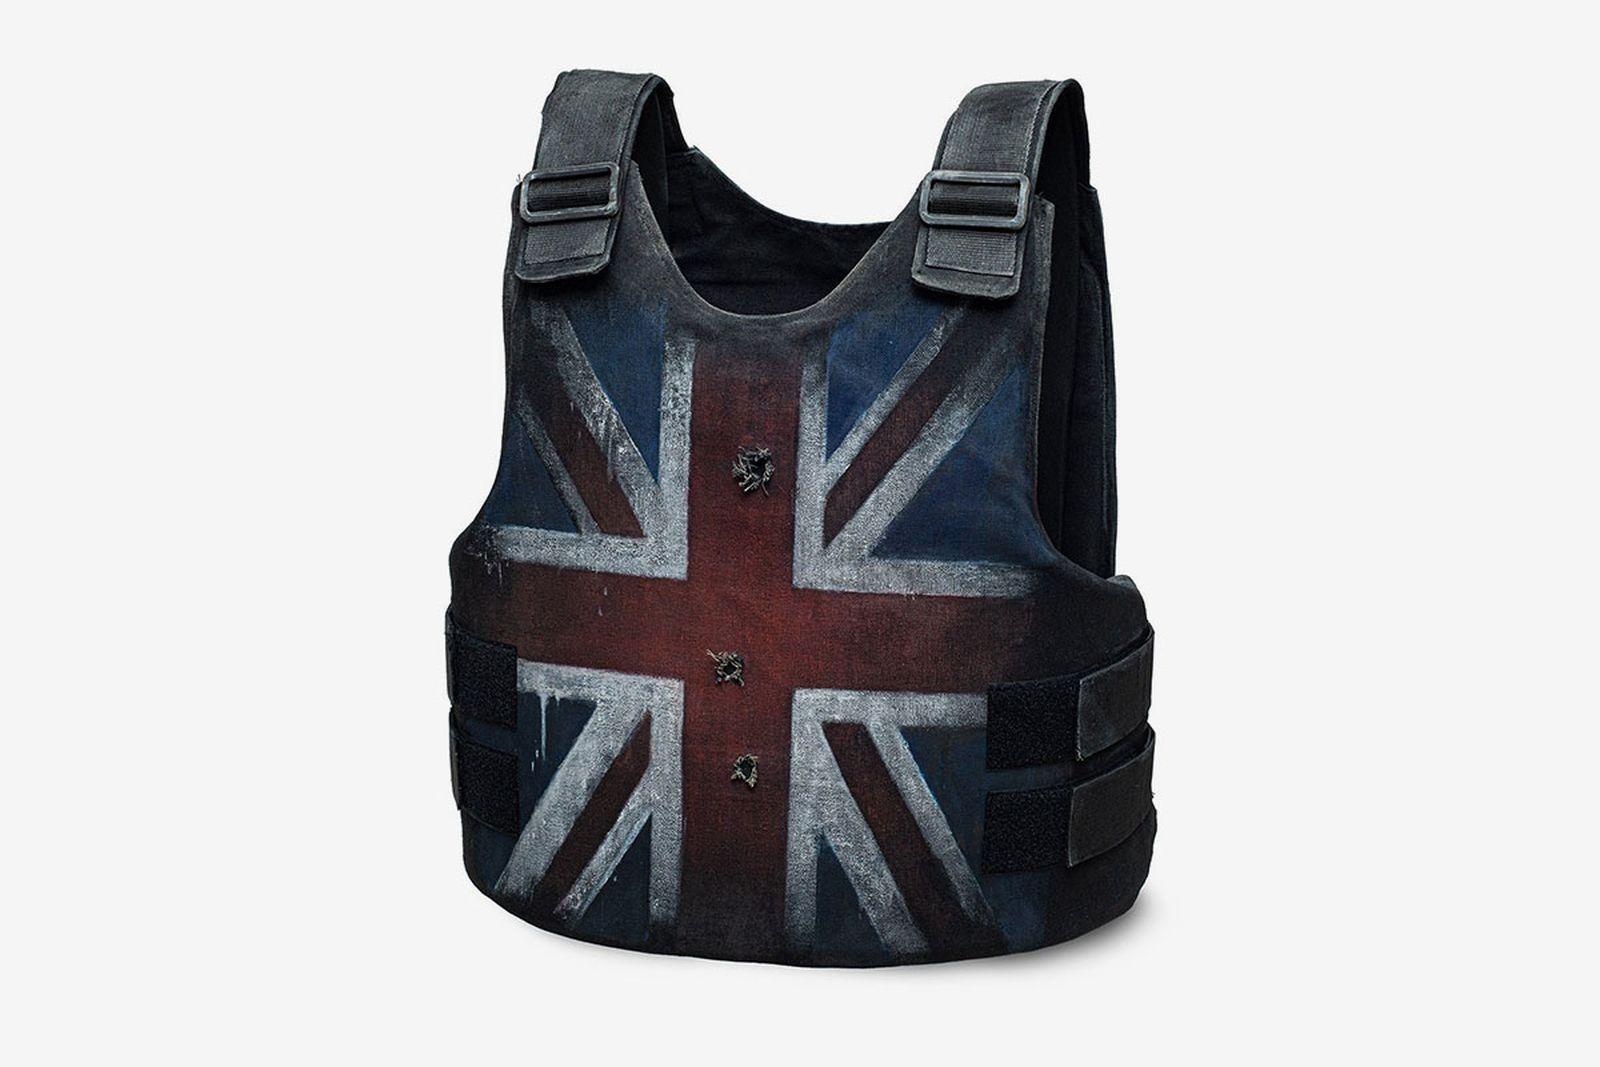 Banksy Gross Domestic Product vest